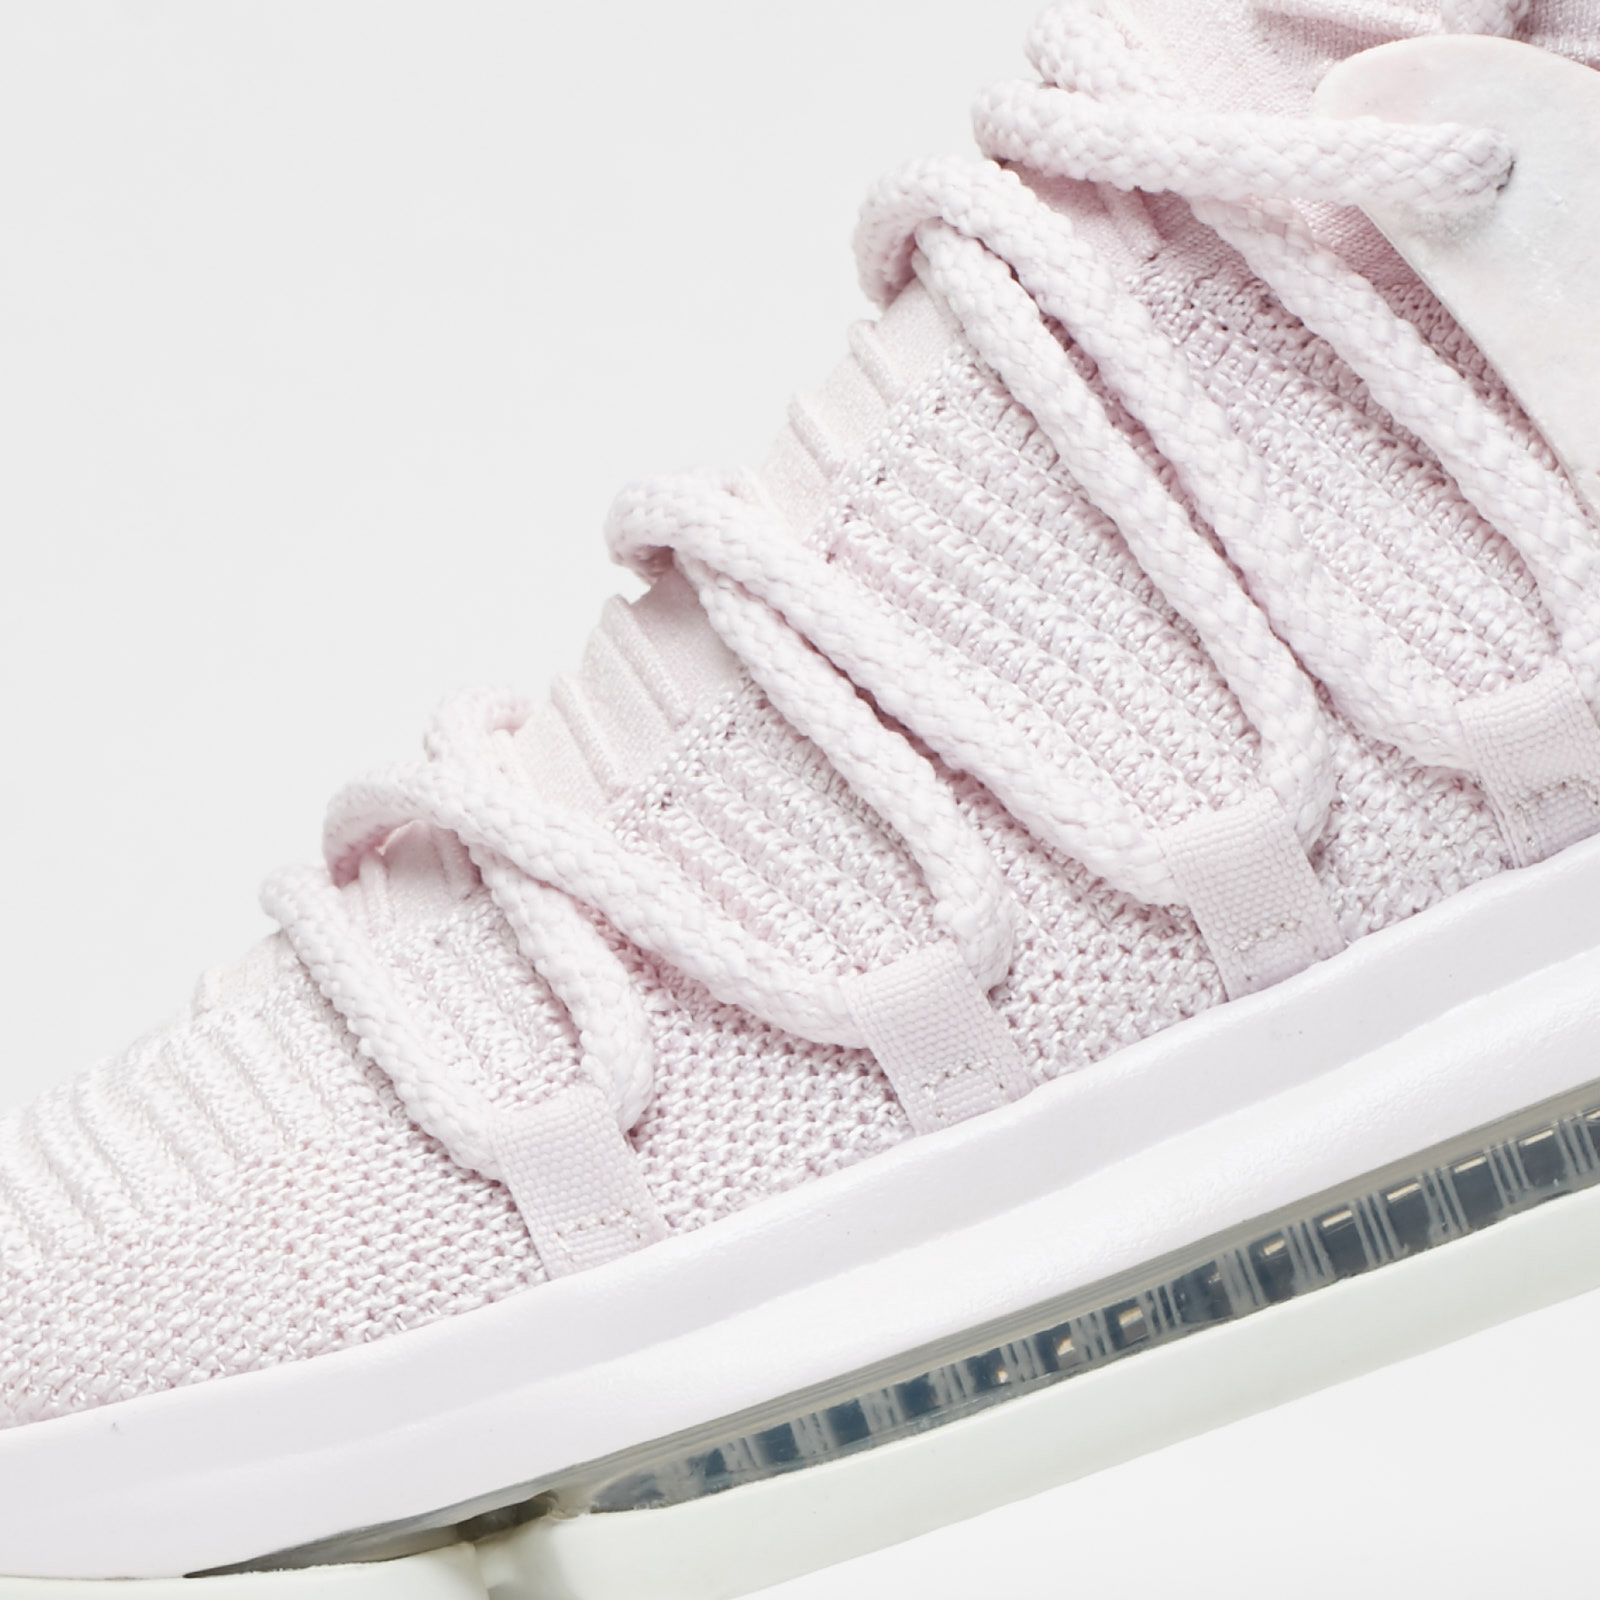 30d4d094b8ea Nike Zoom KD10 AP - Aq4110-600 - Sneakersnstuff